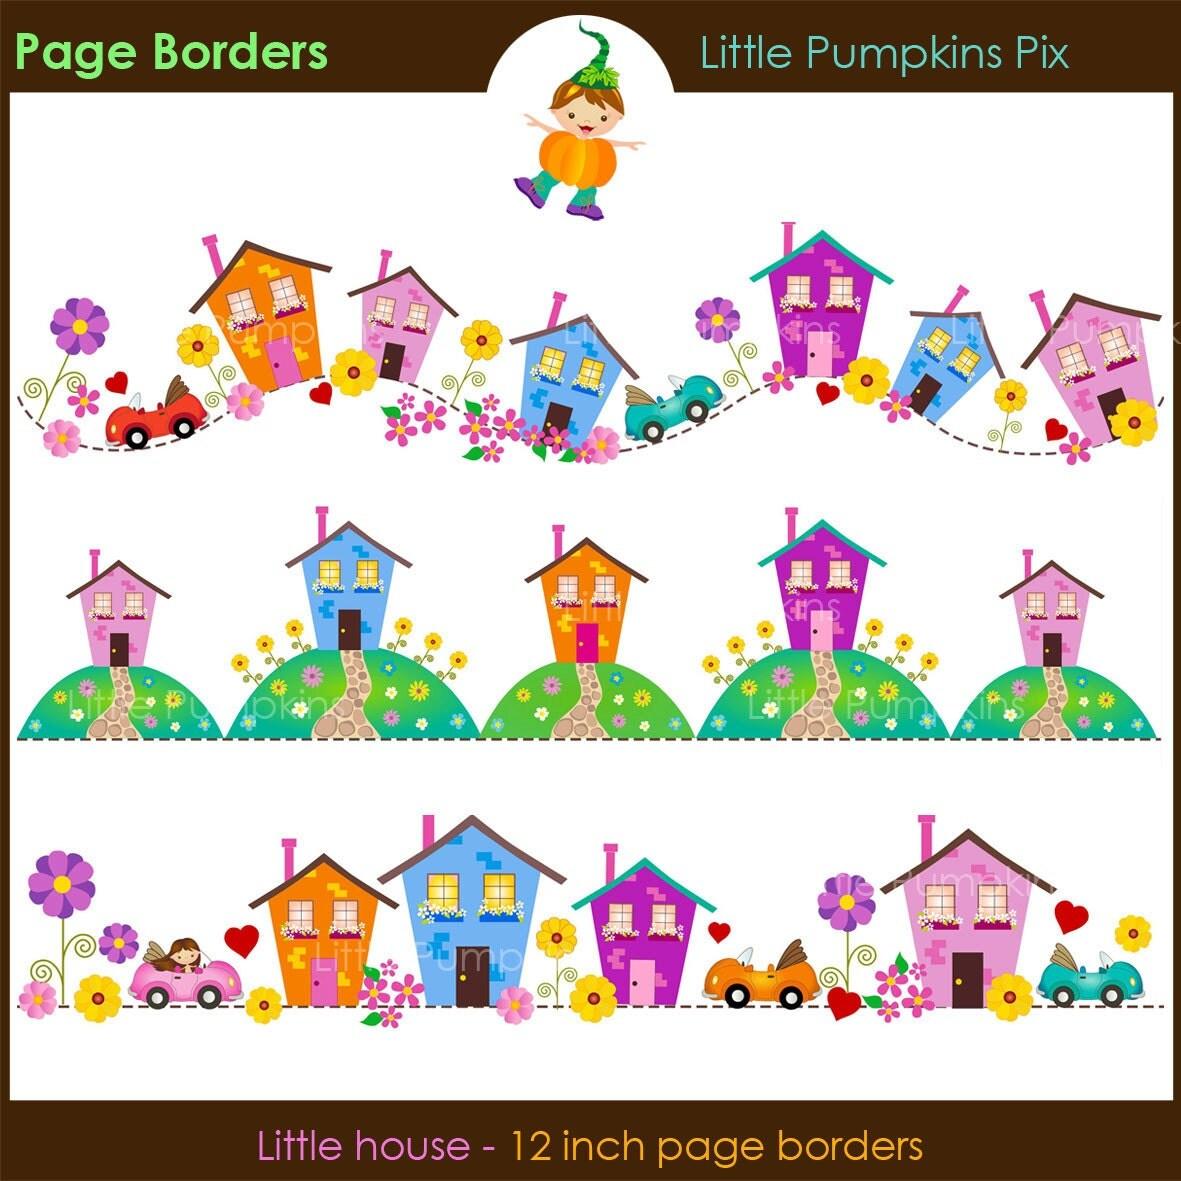 LITTLE HOUSE Digital Scrapbook Page Borders. Cute house